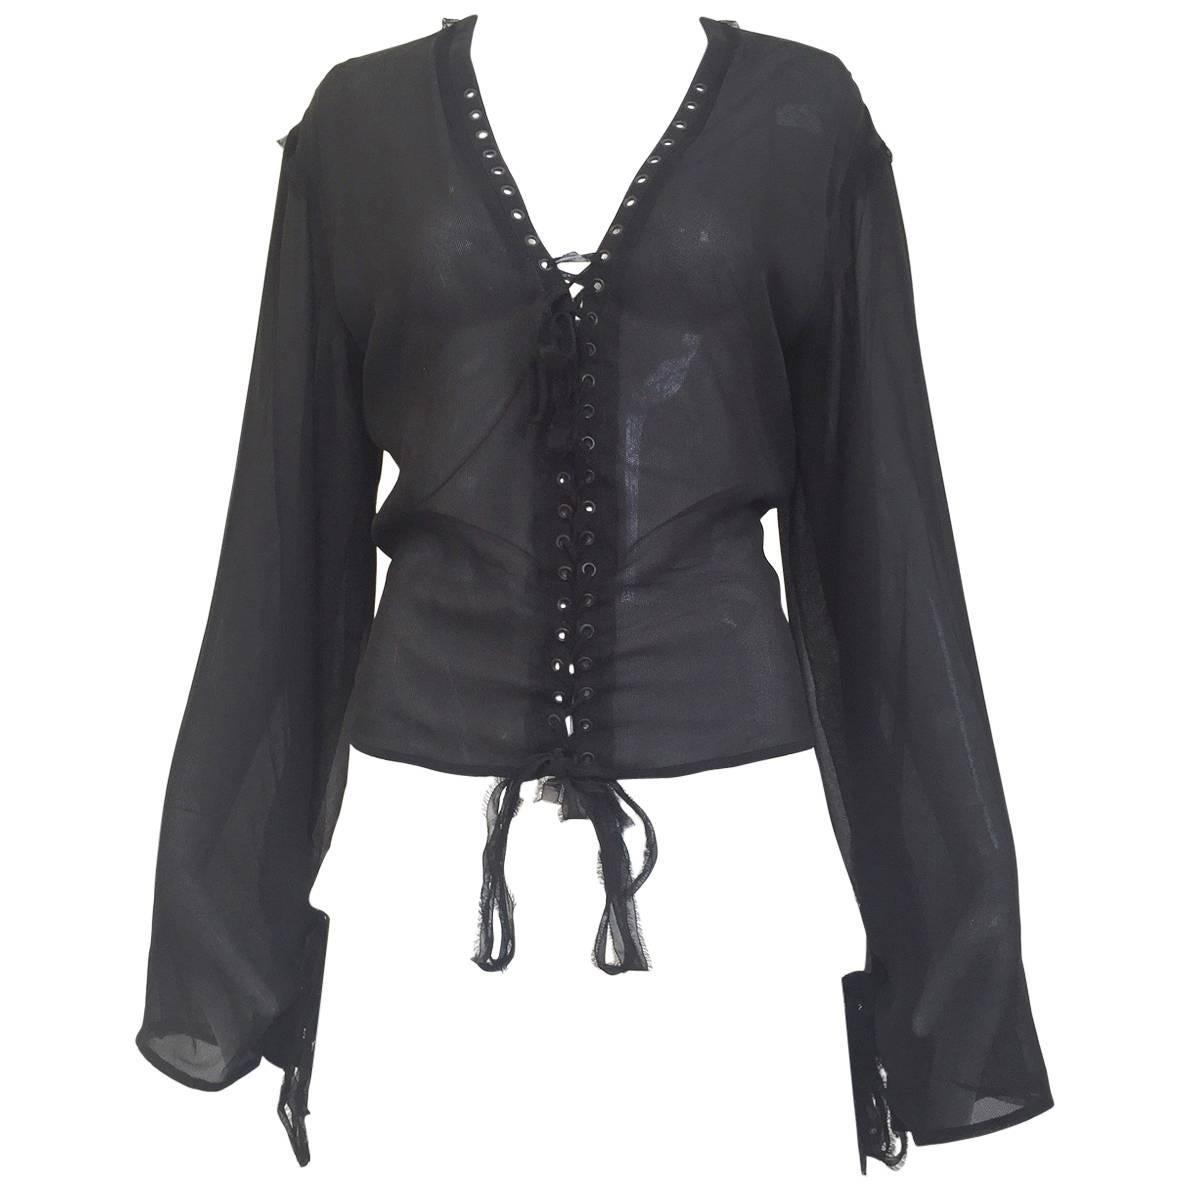 Yves Saint Laurent by Tom Ford black silk blouse